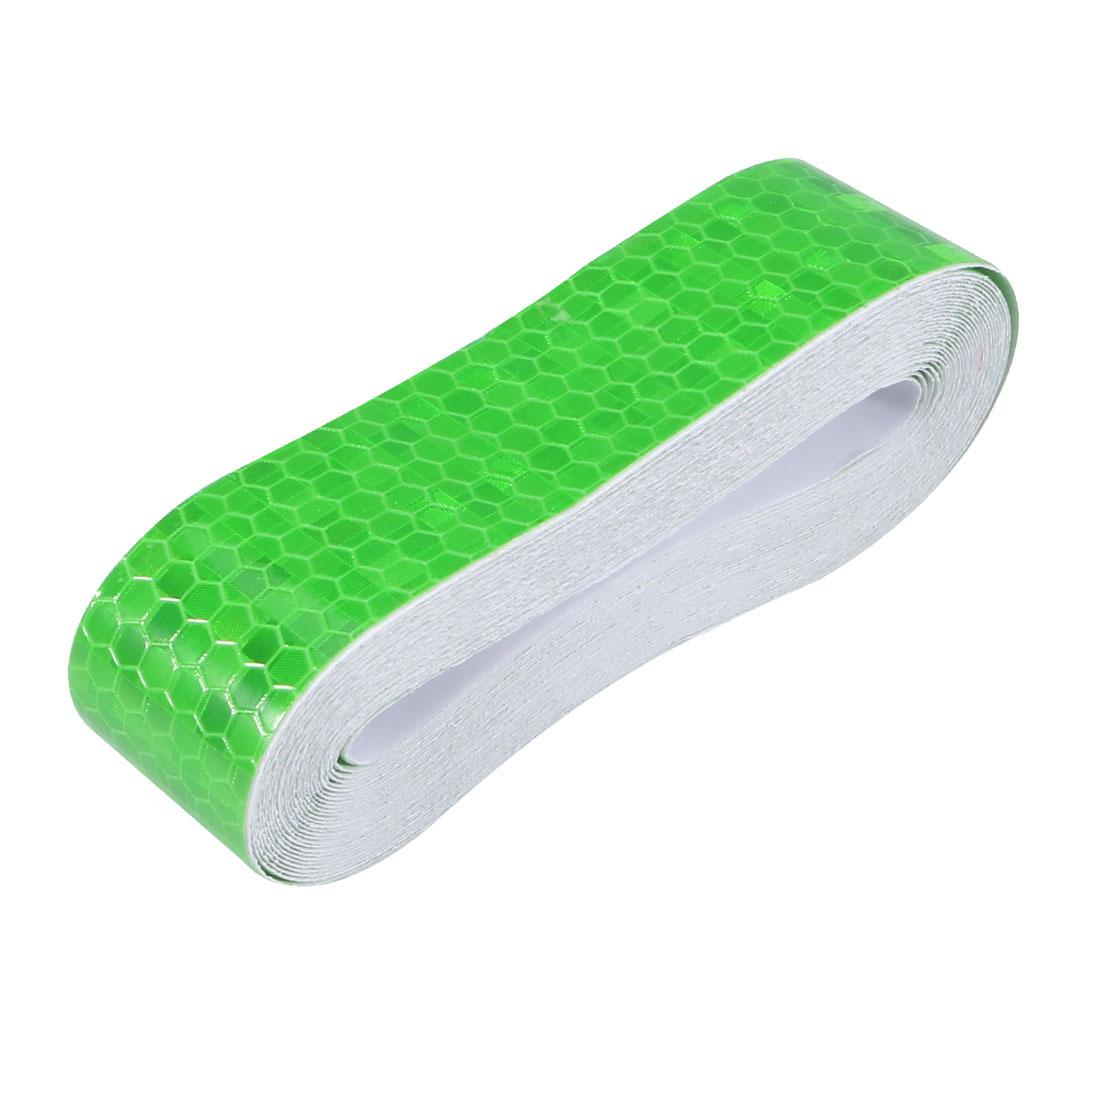 Honeycomb Reflective Warning Tape Film Sticker Green 25mm Width 5m Length